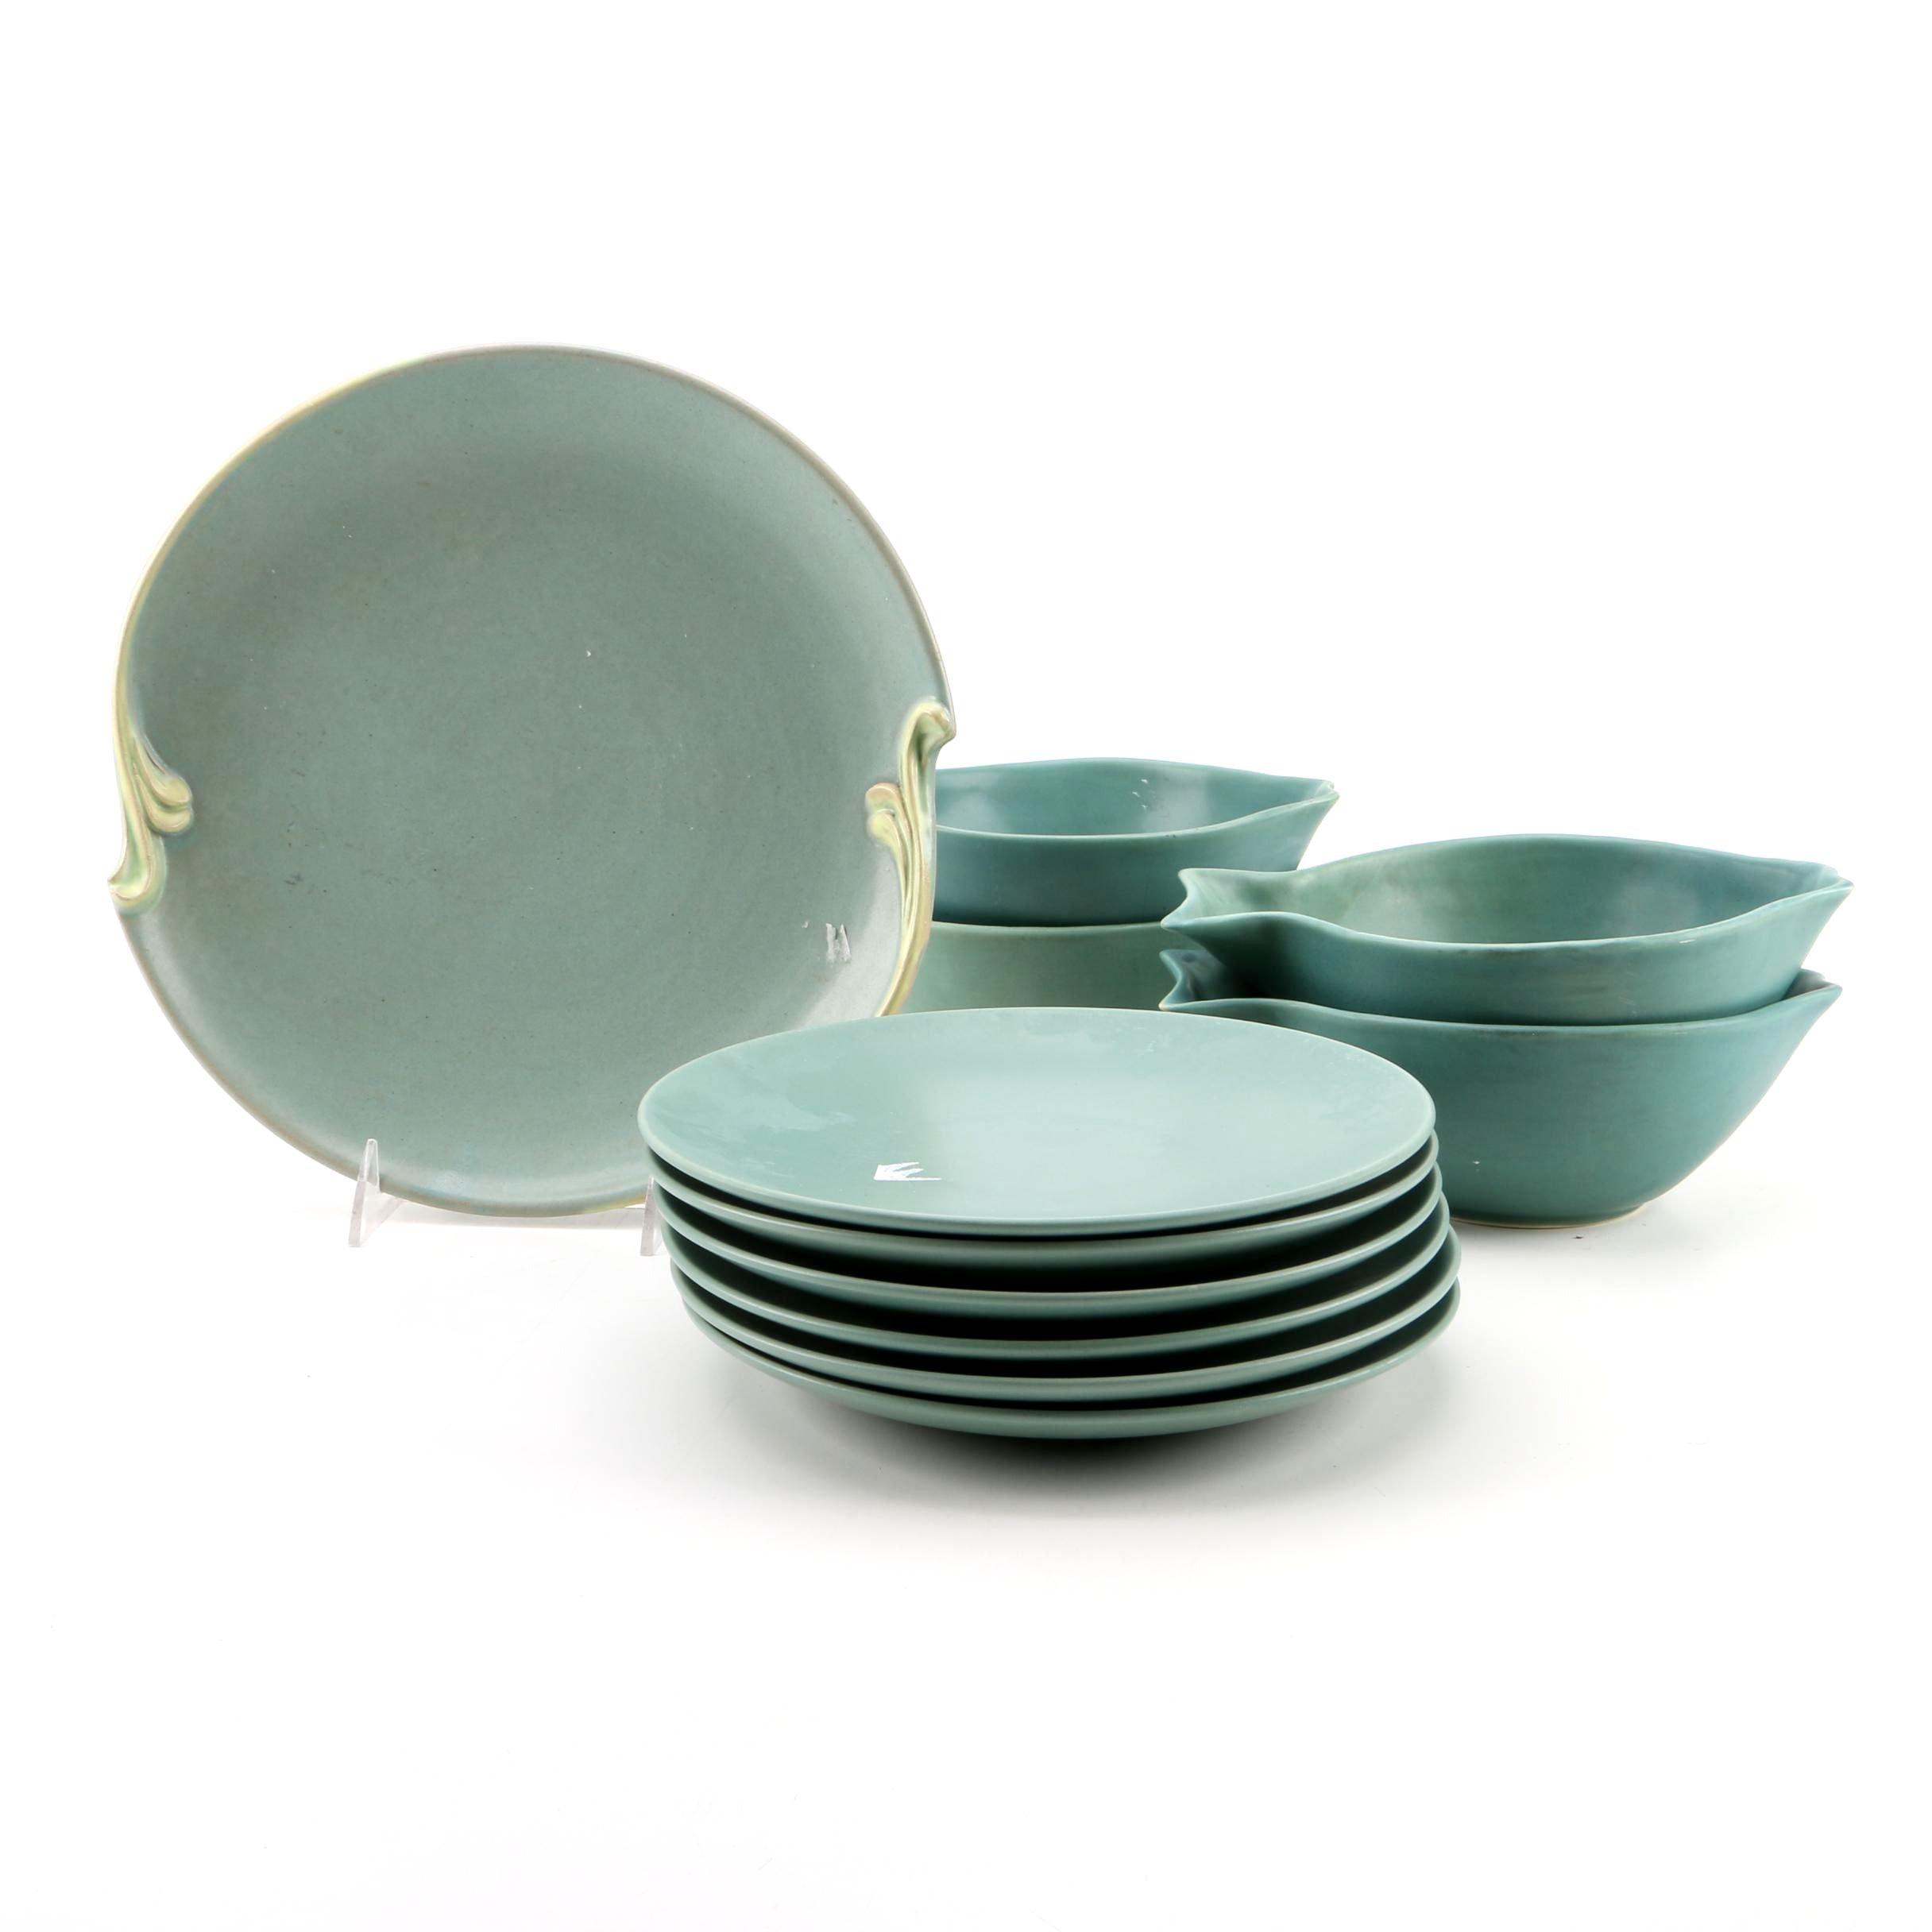 Zen Garden and Furio Sage Green Plates with Fish Shaped Bowls ...  sc 1 st  EBTH.com & Zen Garden and Furio Sage Green Plates with Fish Shaped Bowls : EBTH